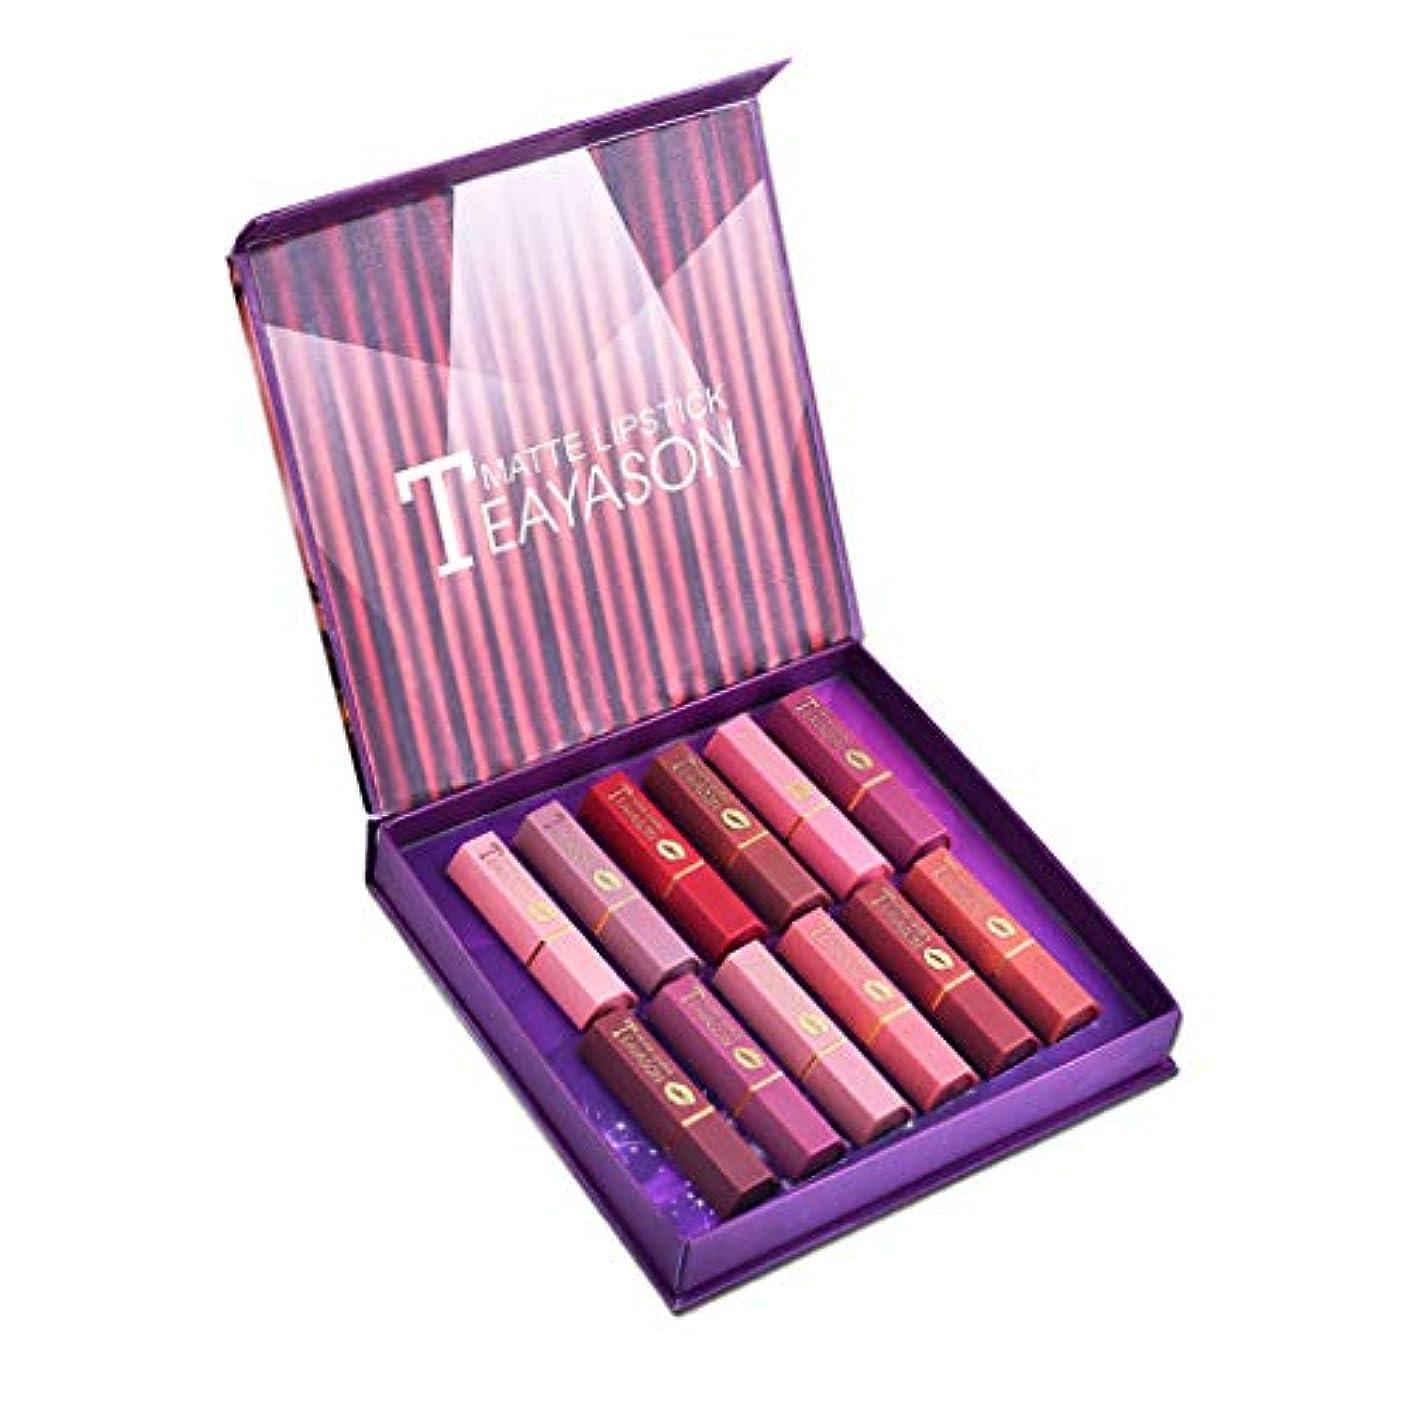 Perfeclan ミニマット 口紅セット 長持ち色 化粧品 メイク リップグロス スティック キット 12色セット